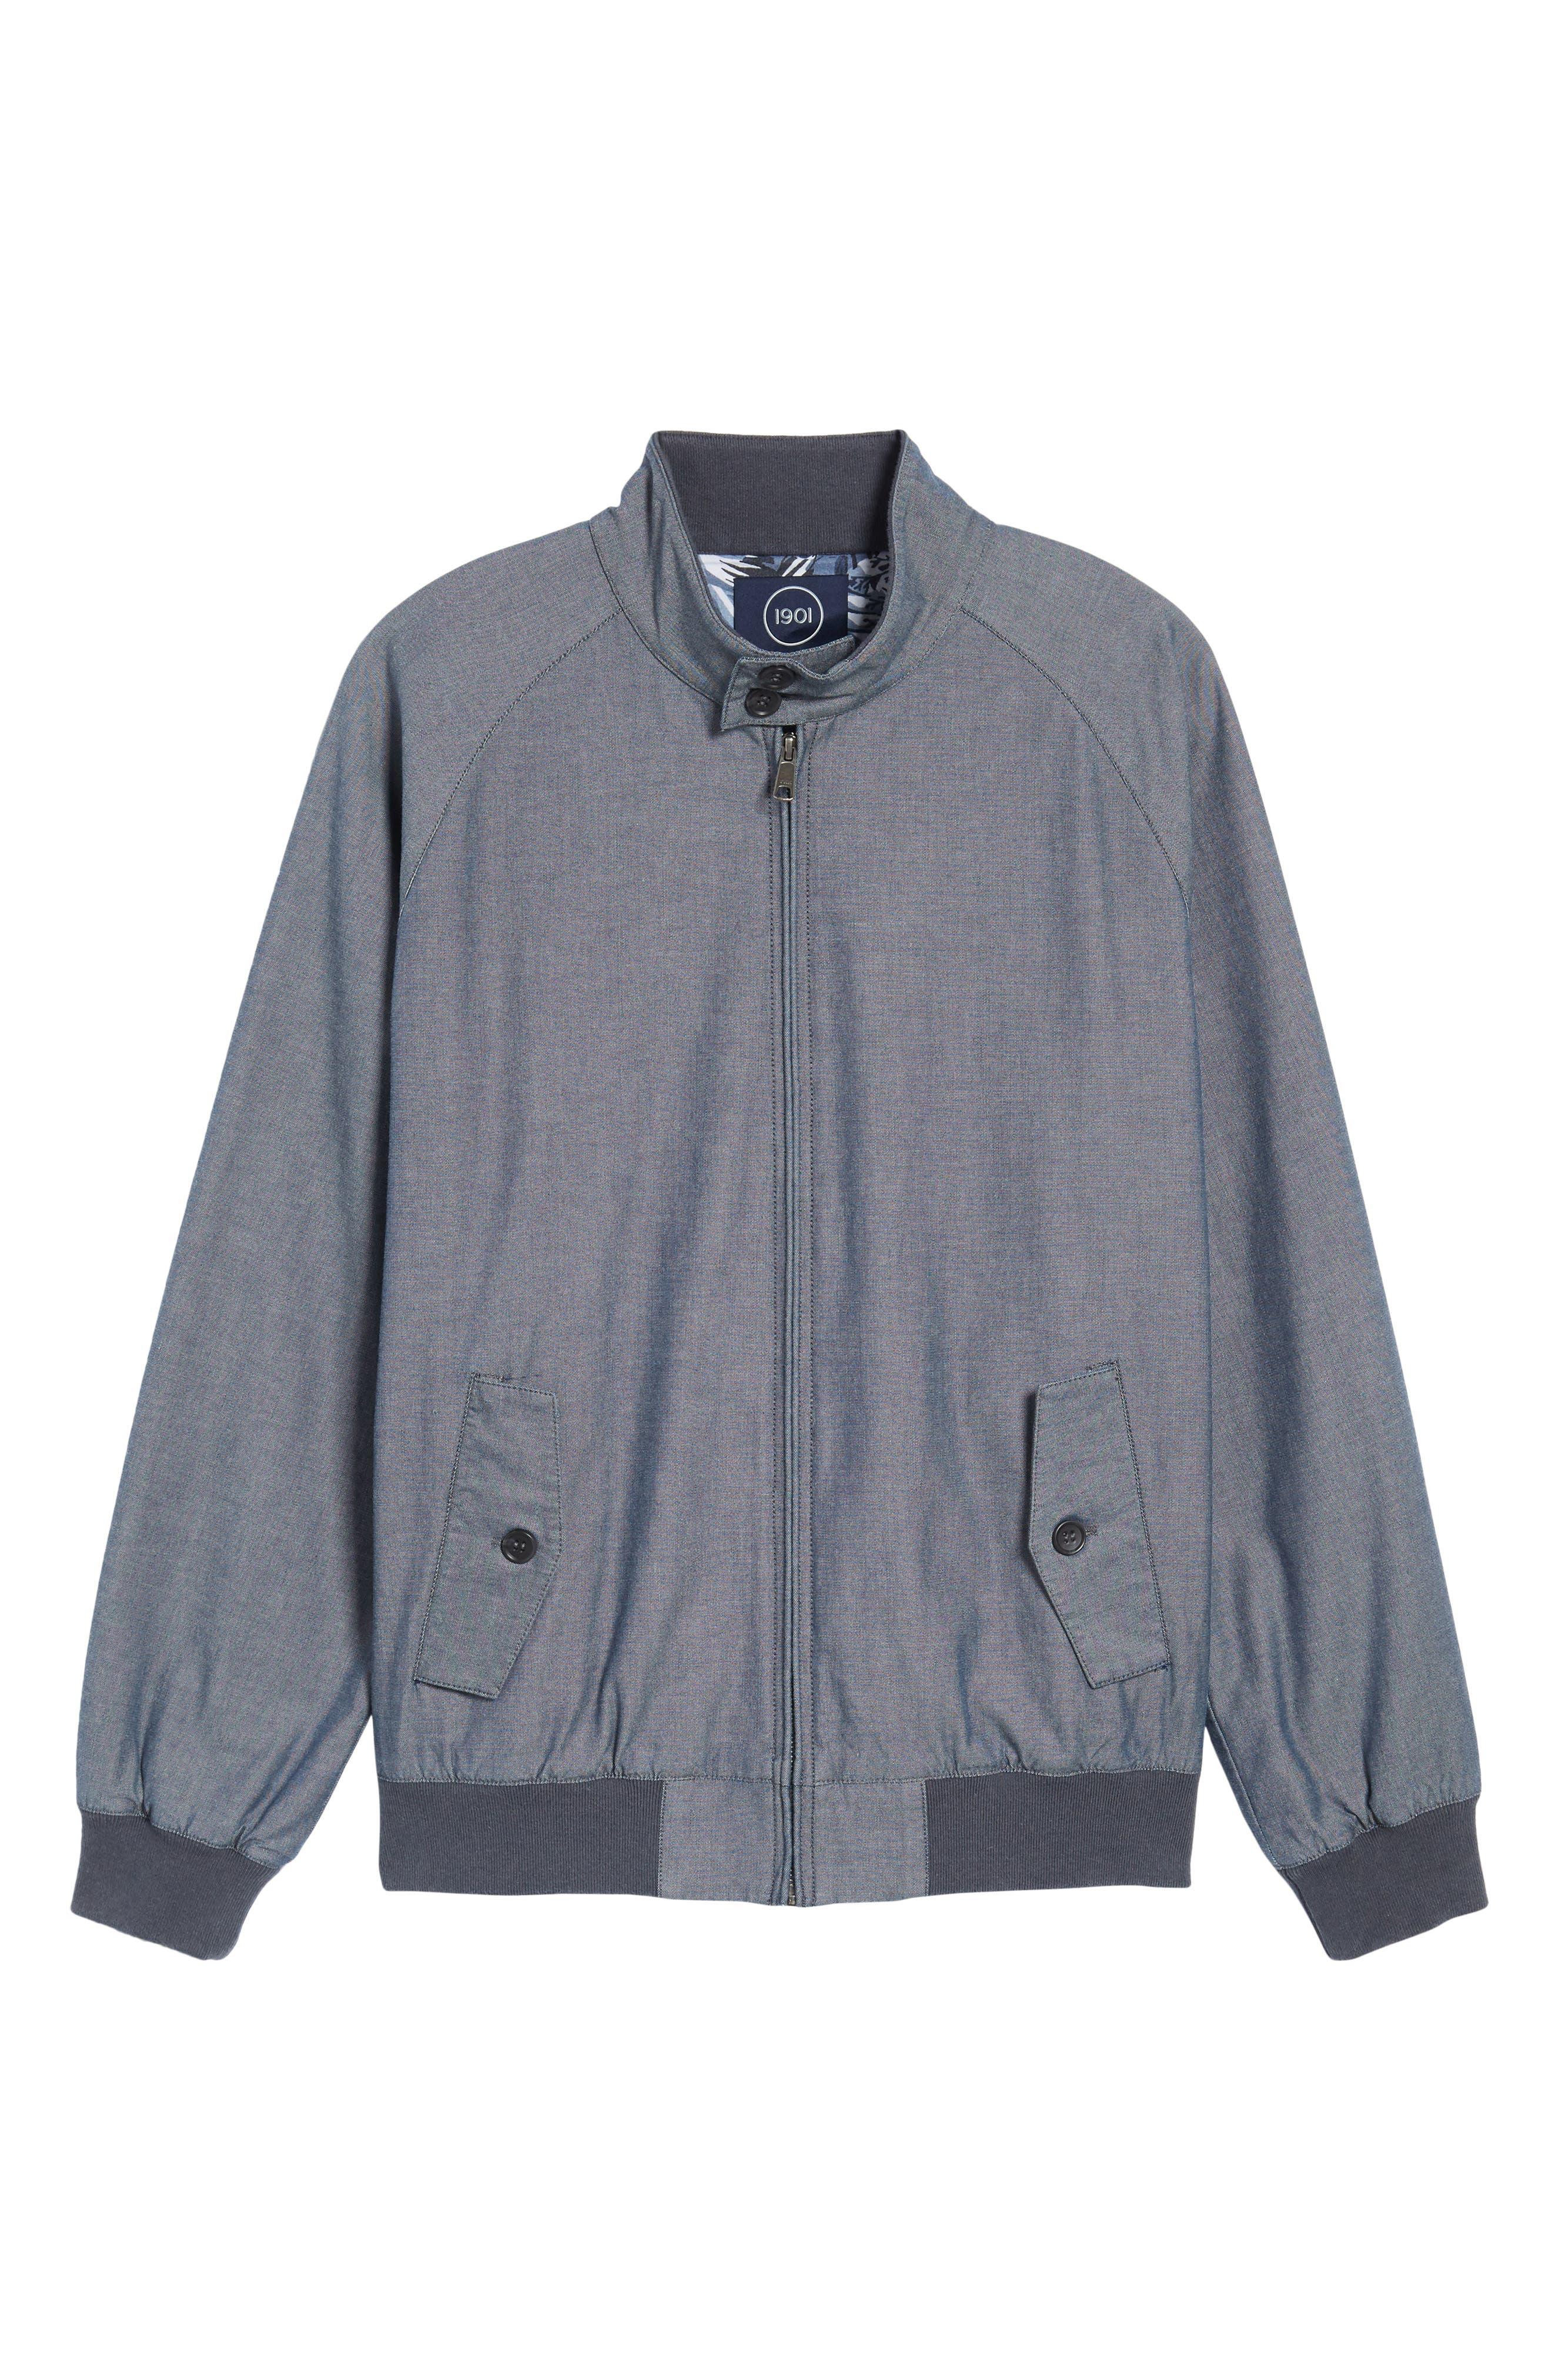 Harrington Jacket,                             Alternate thumbnail 5, color,                             420